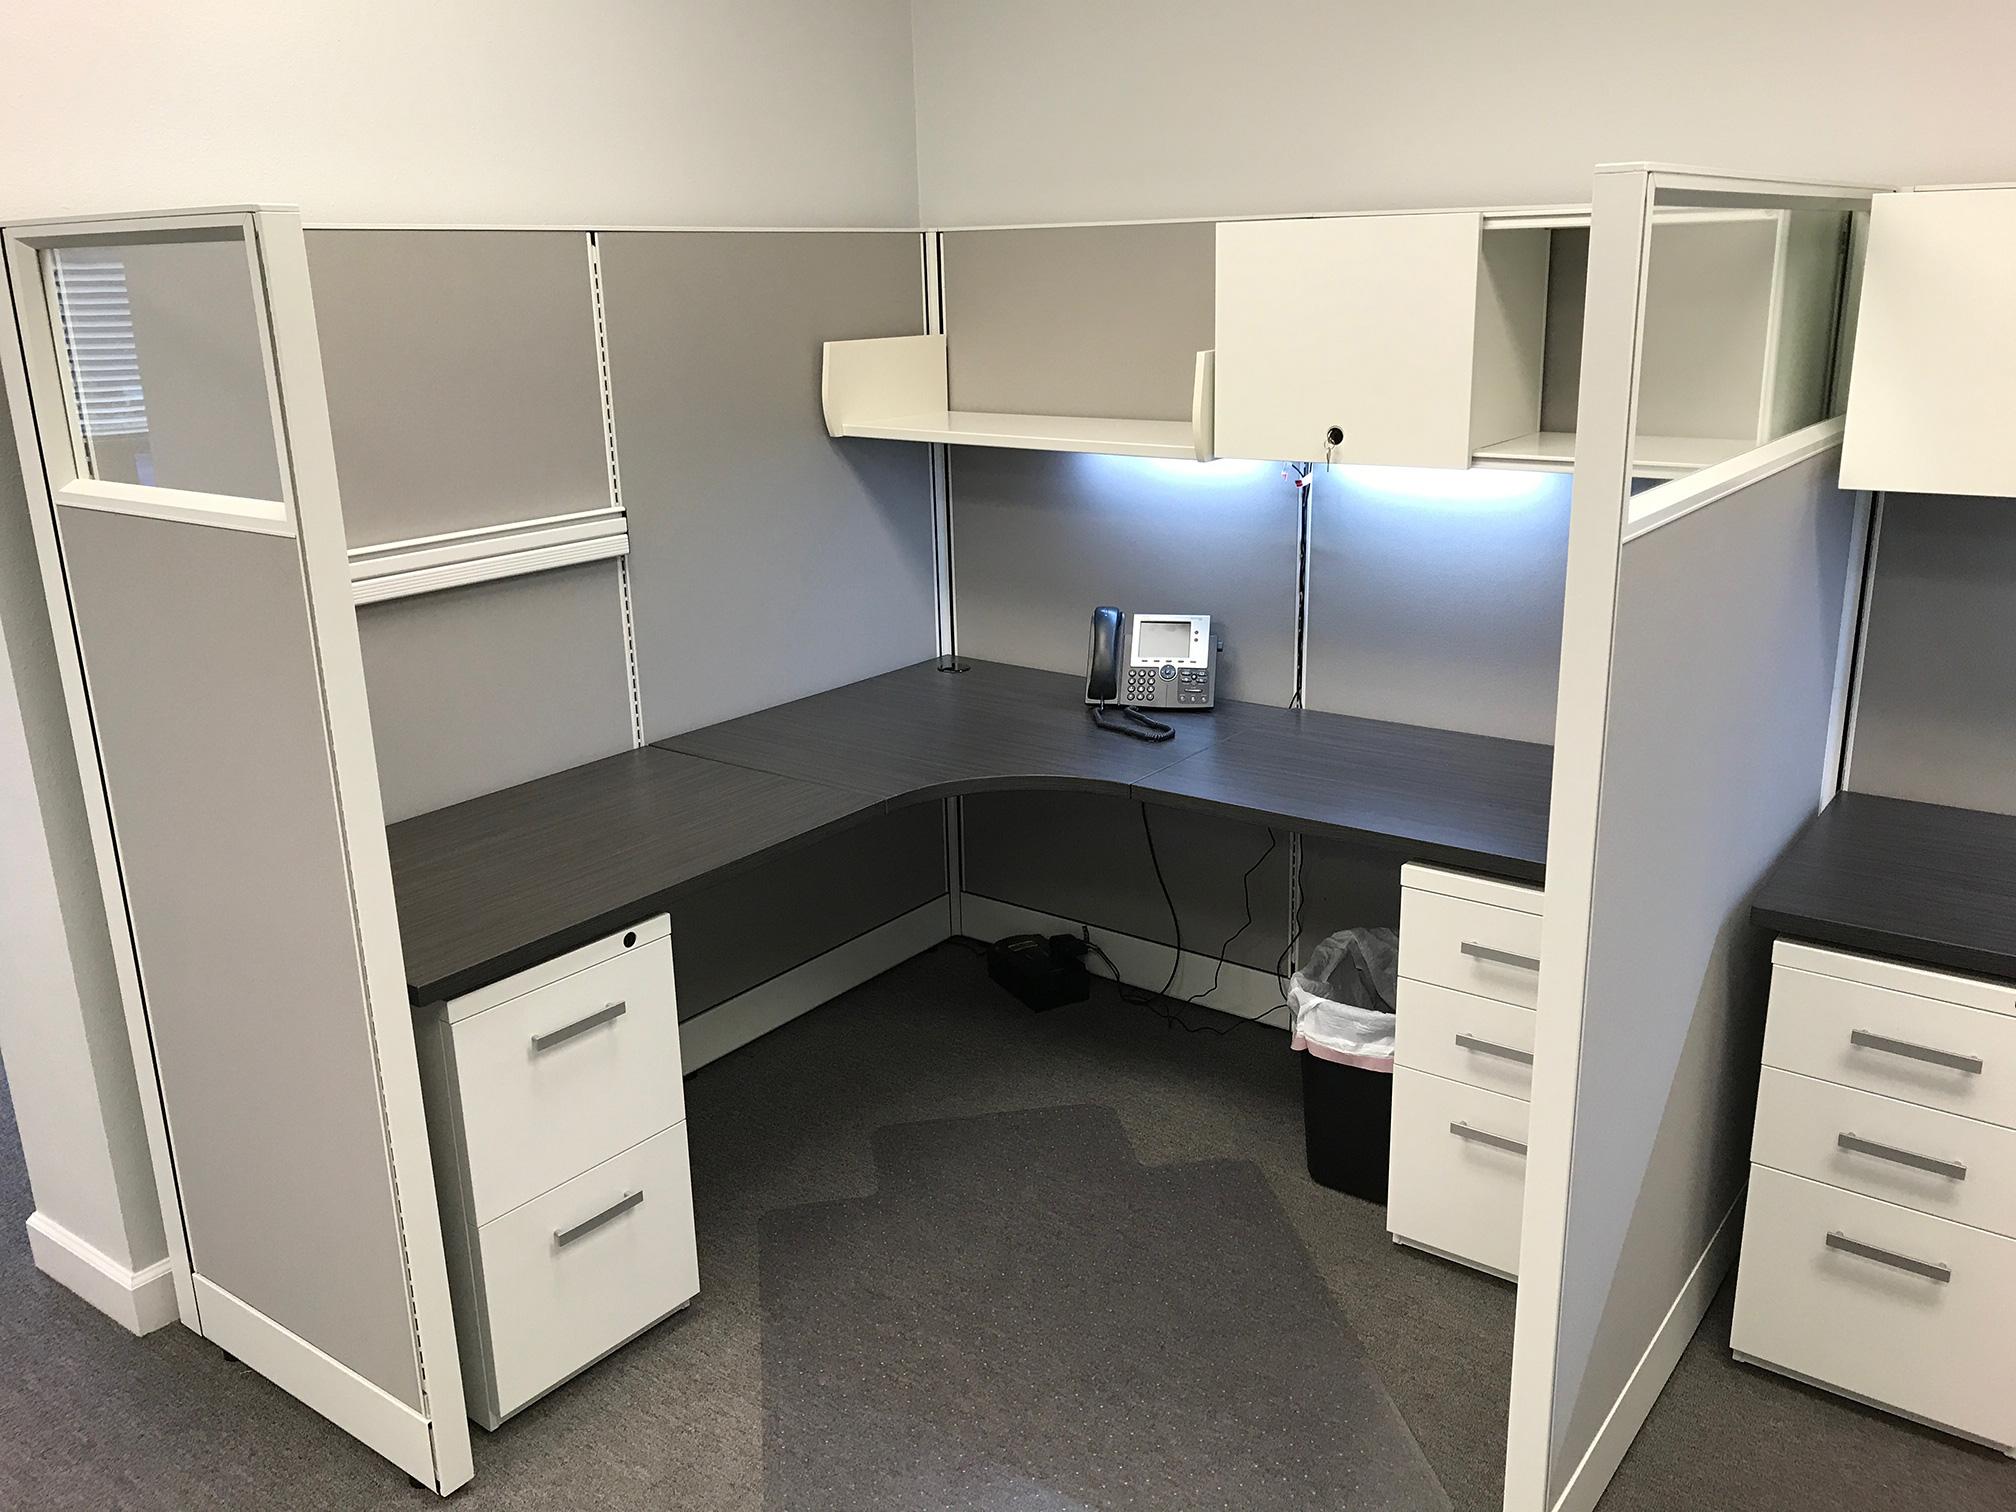 cubicle-systems-bradenton-florida-manasota-office-supplies-llc.jpg